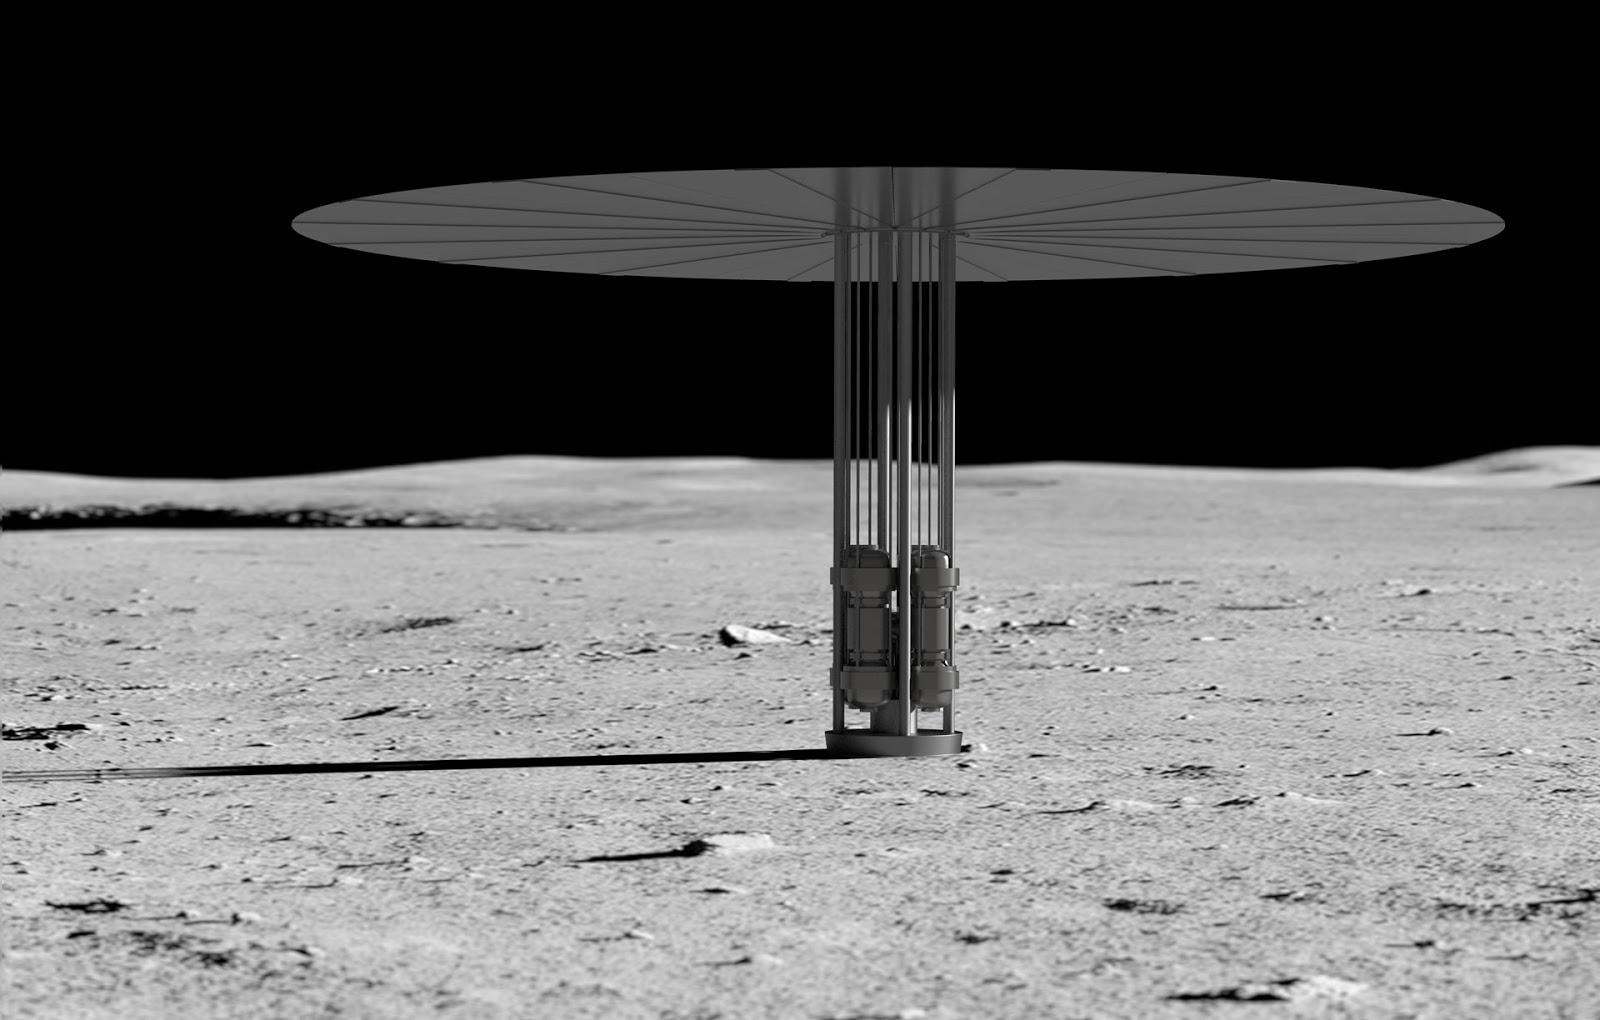 Визуализация реактора Kilopower, размещенного на Луне